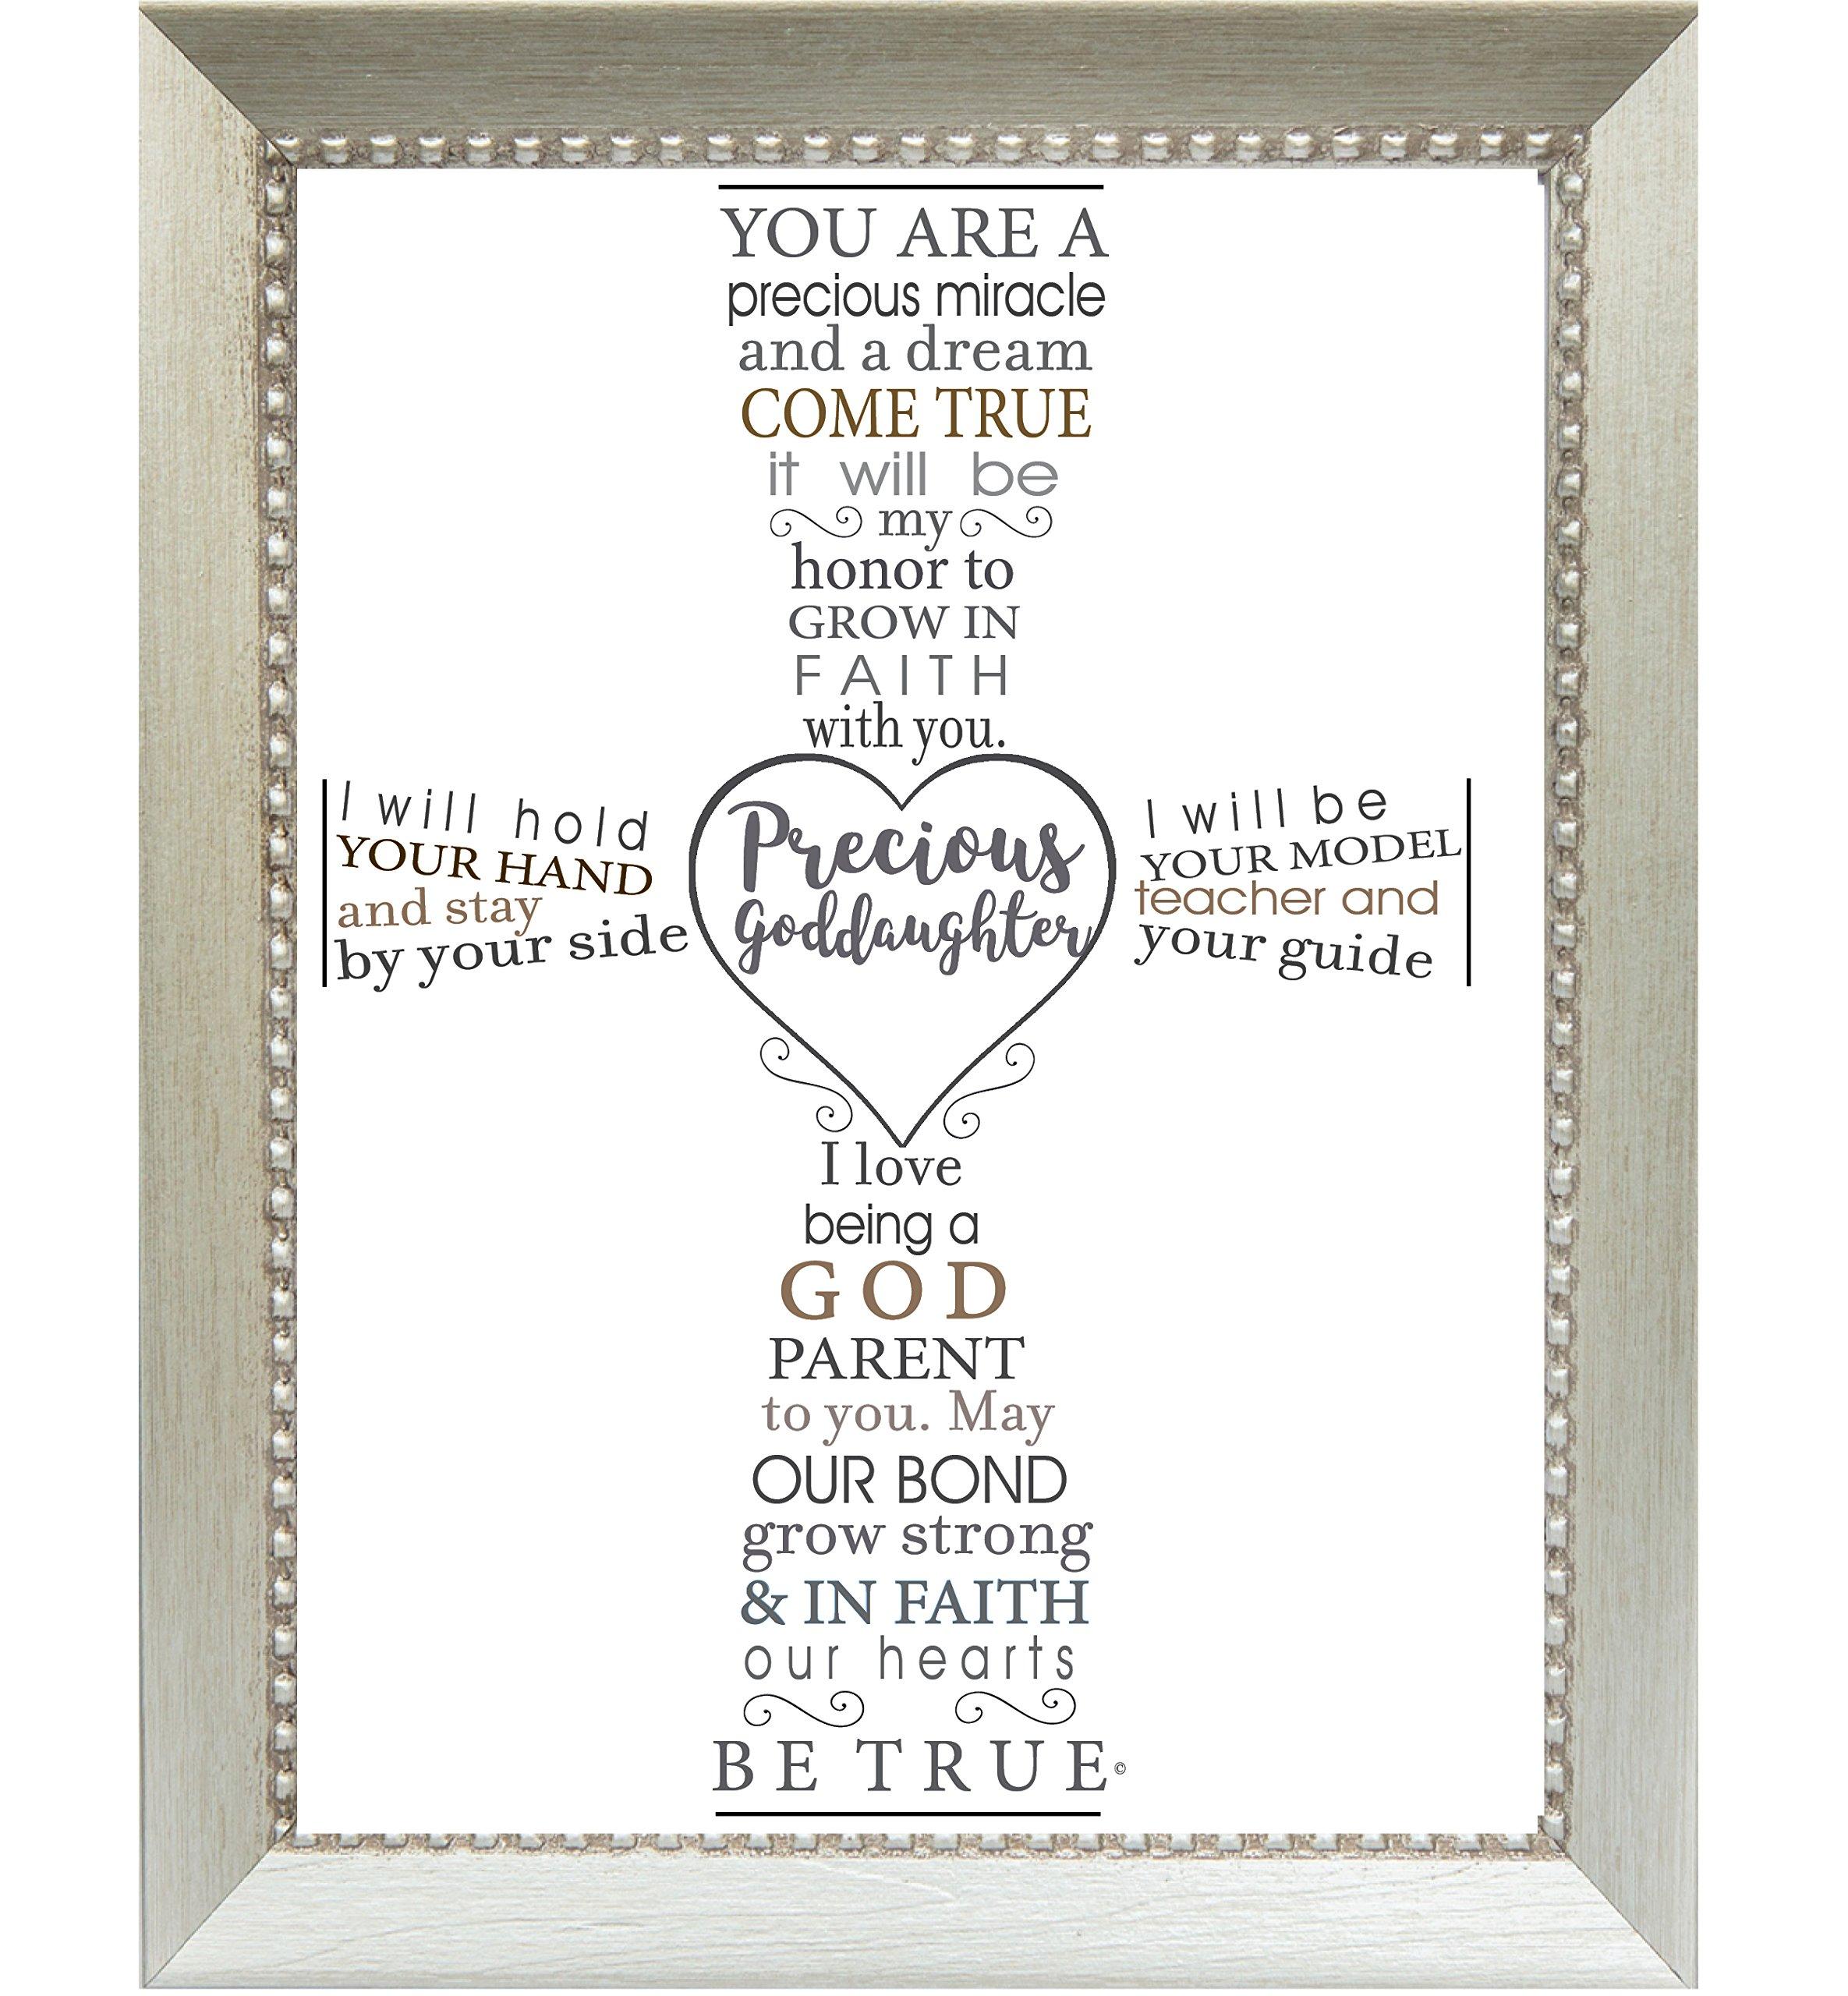 The Grandparent Gift Precious Goddaughter Frame Baptism or Christening Gift from Godparent, Silver